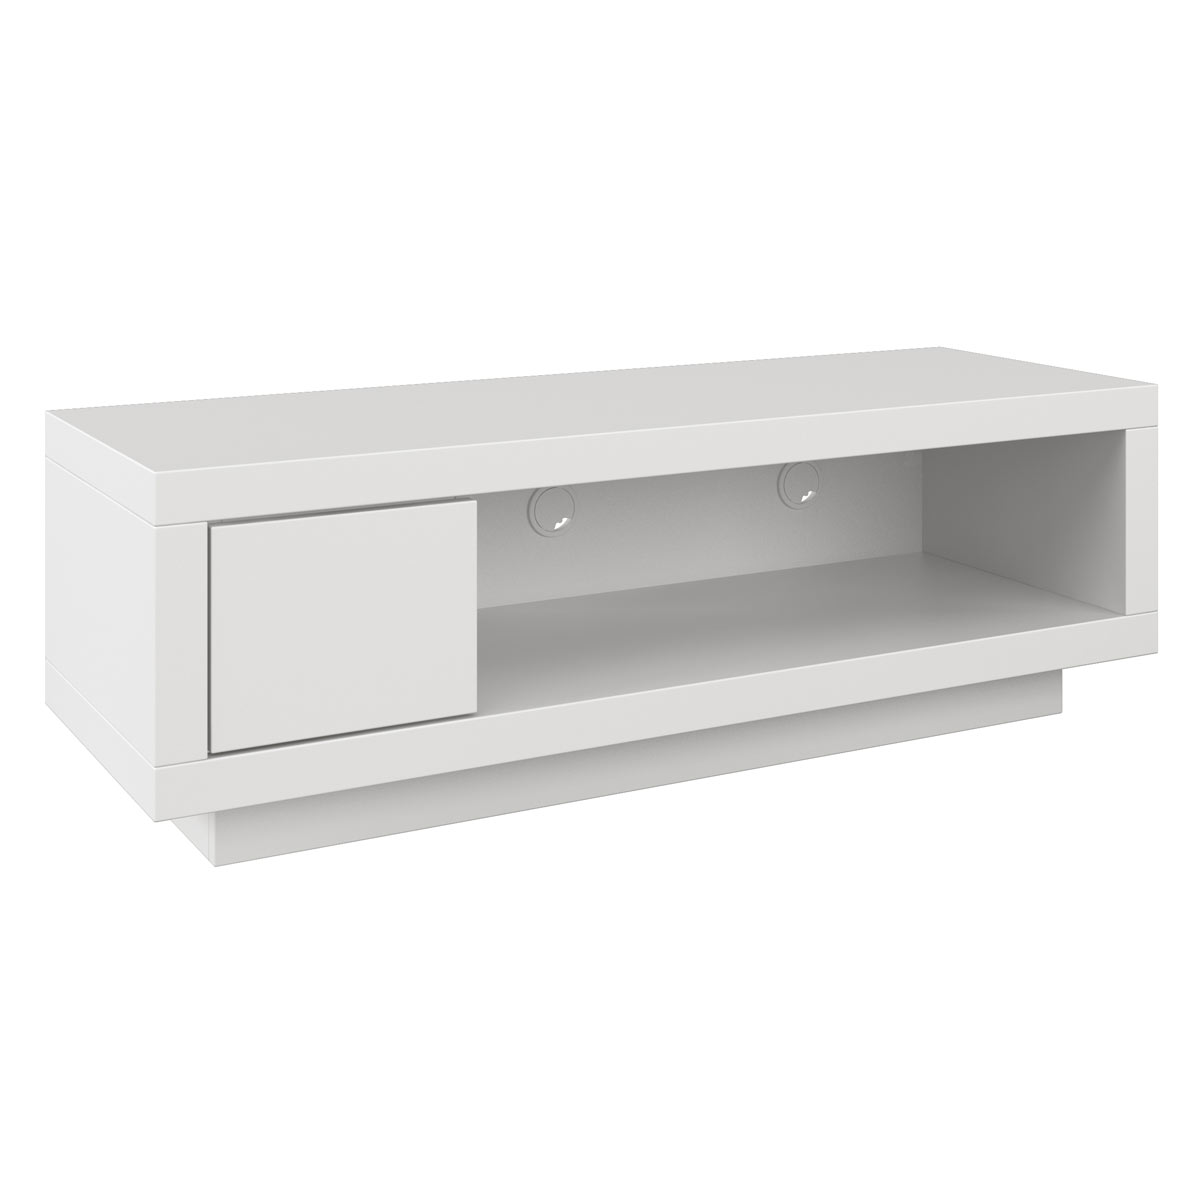 Schnepel varic l blanc avec tiroir meuble tv schnepel sur ldlc - Meuble tv avec tiroir ...